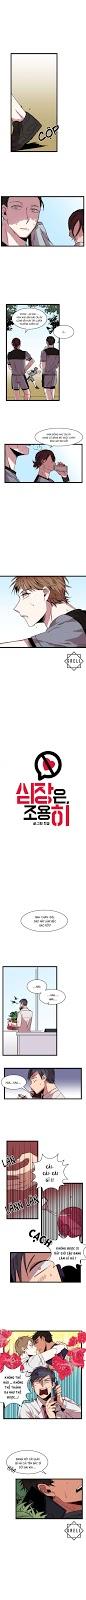 Trang 1 - [ Manhwa ] Trái tim thầm lặng - Heart Silent - Chap 008 (- Han Kyeul) - Truyện tranh Gay - Server HostedOnGoogleServerStaging